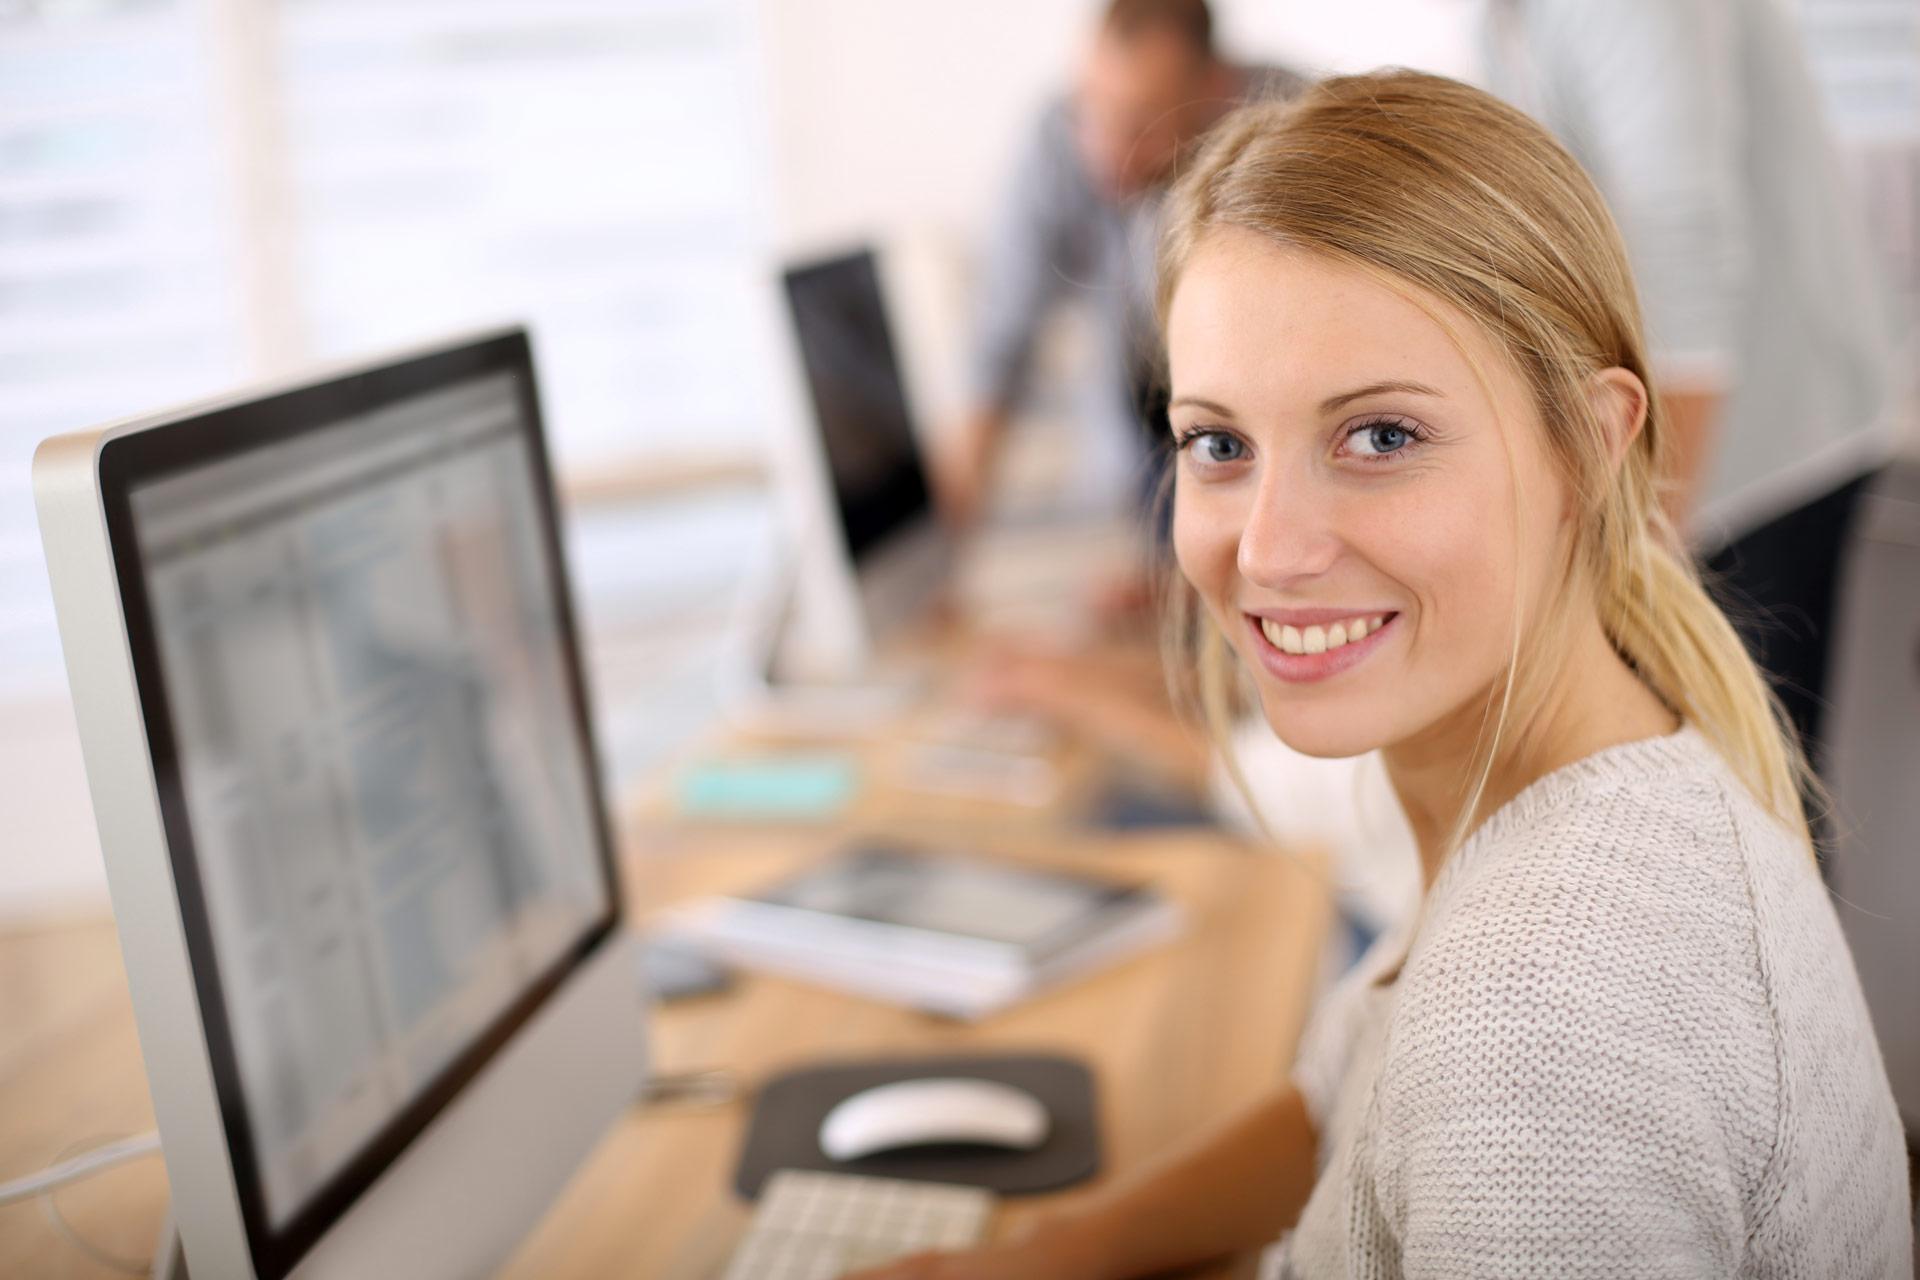 Dame ved datamaskin